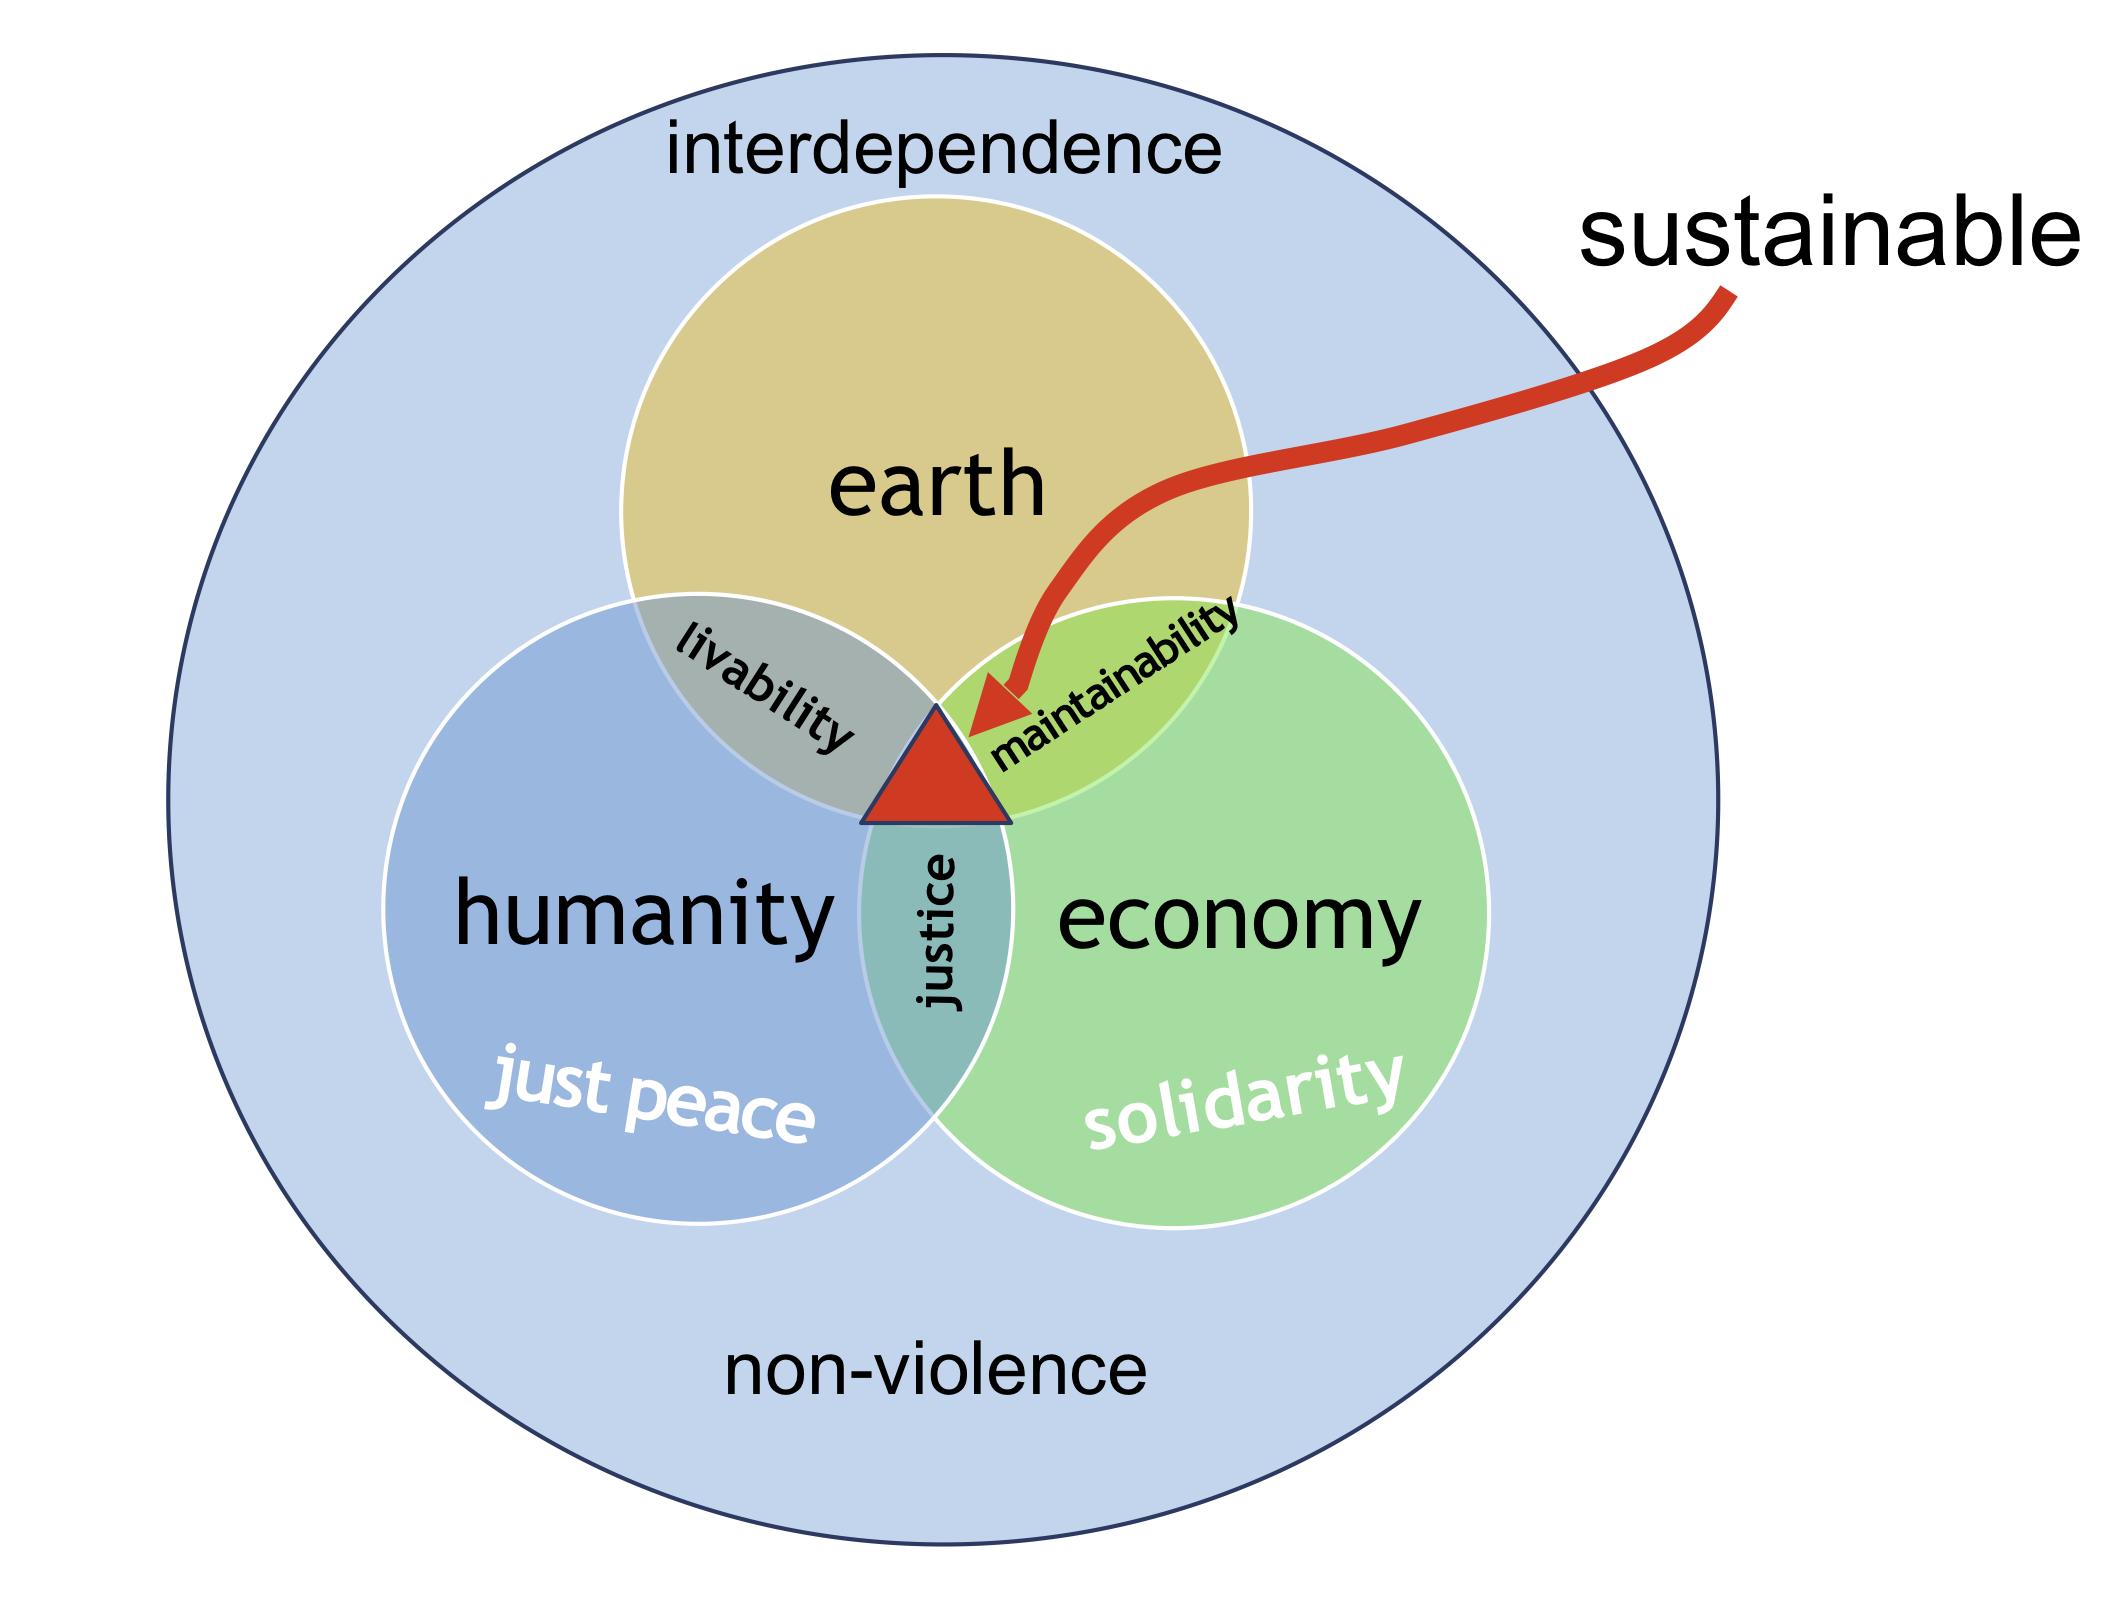 Stuurgroep Duurzame Ontwikkeling (SDO)